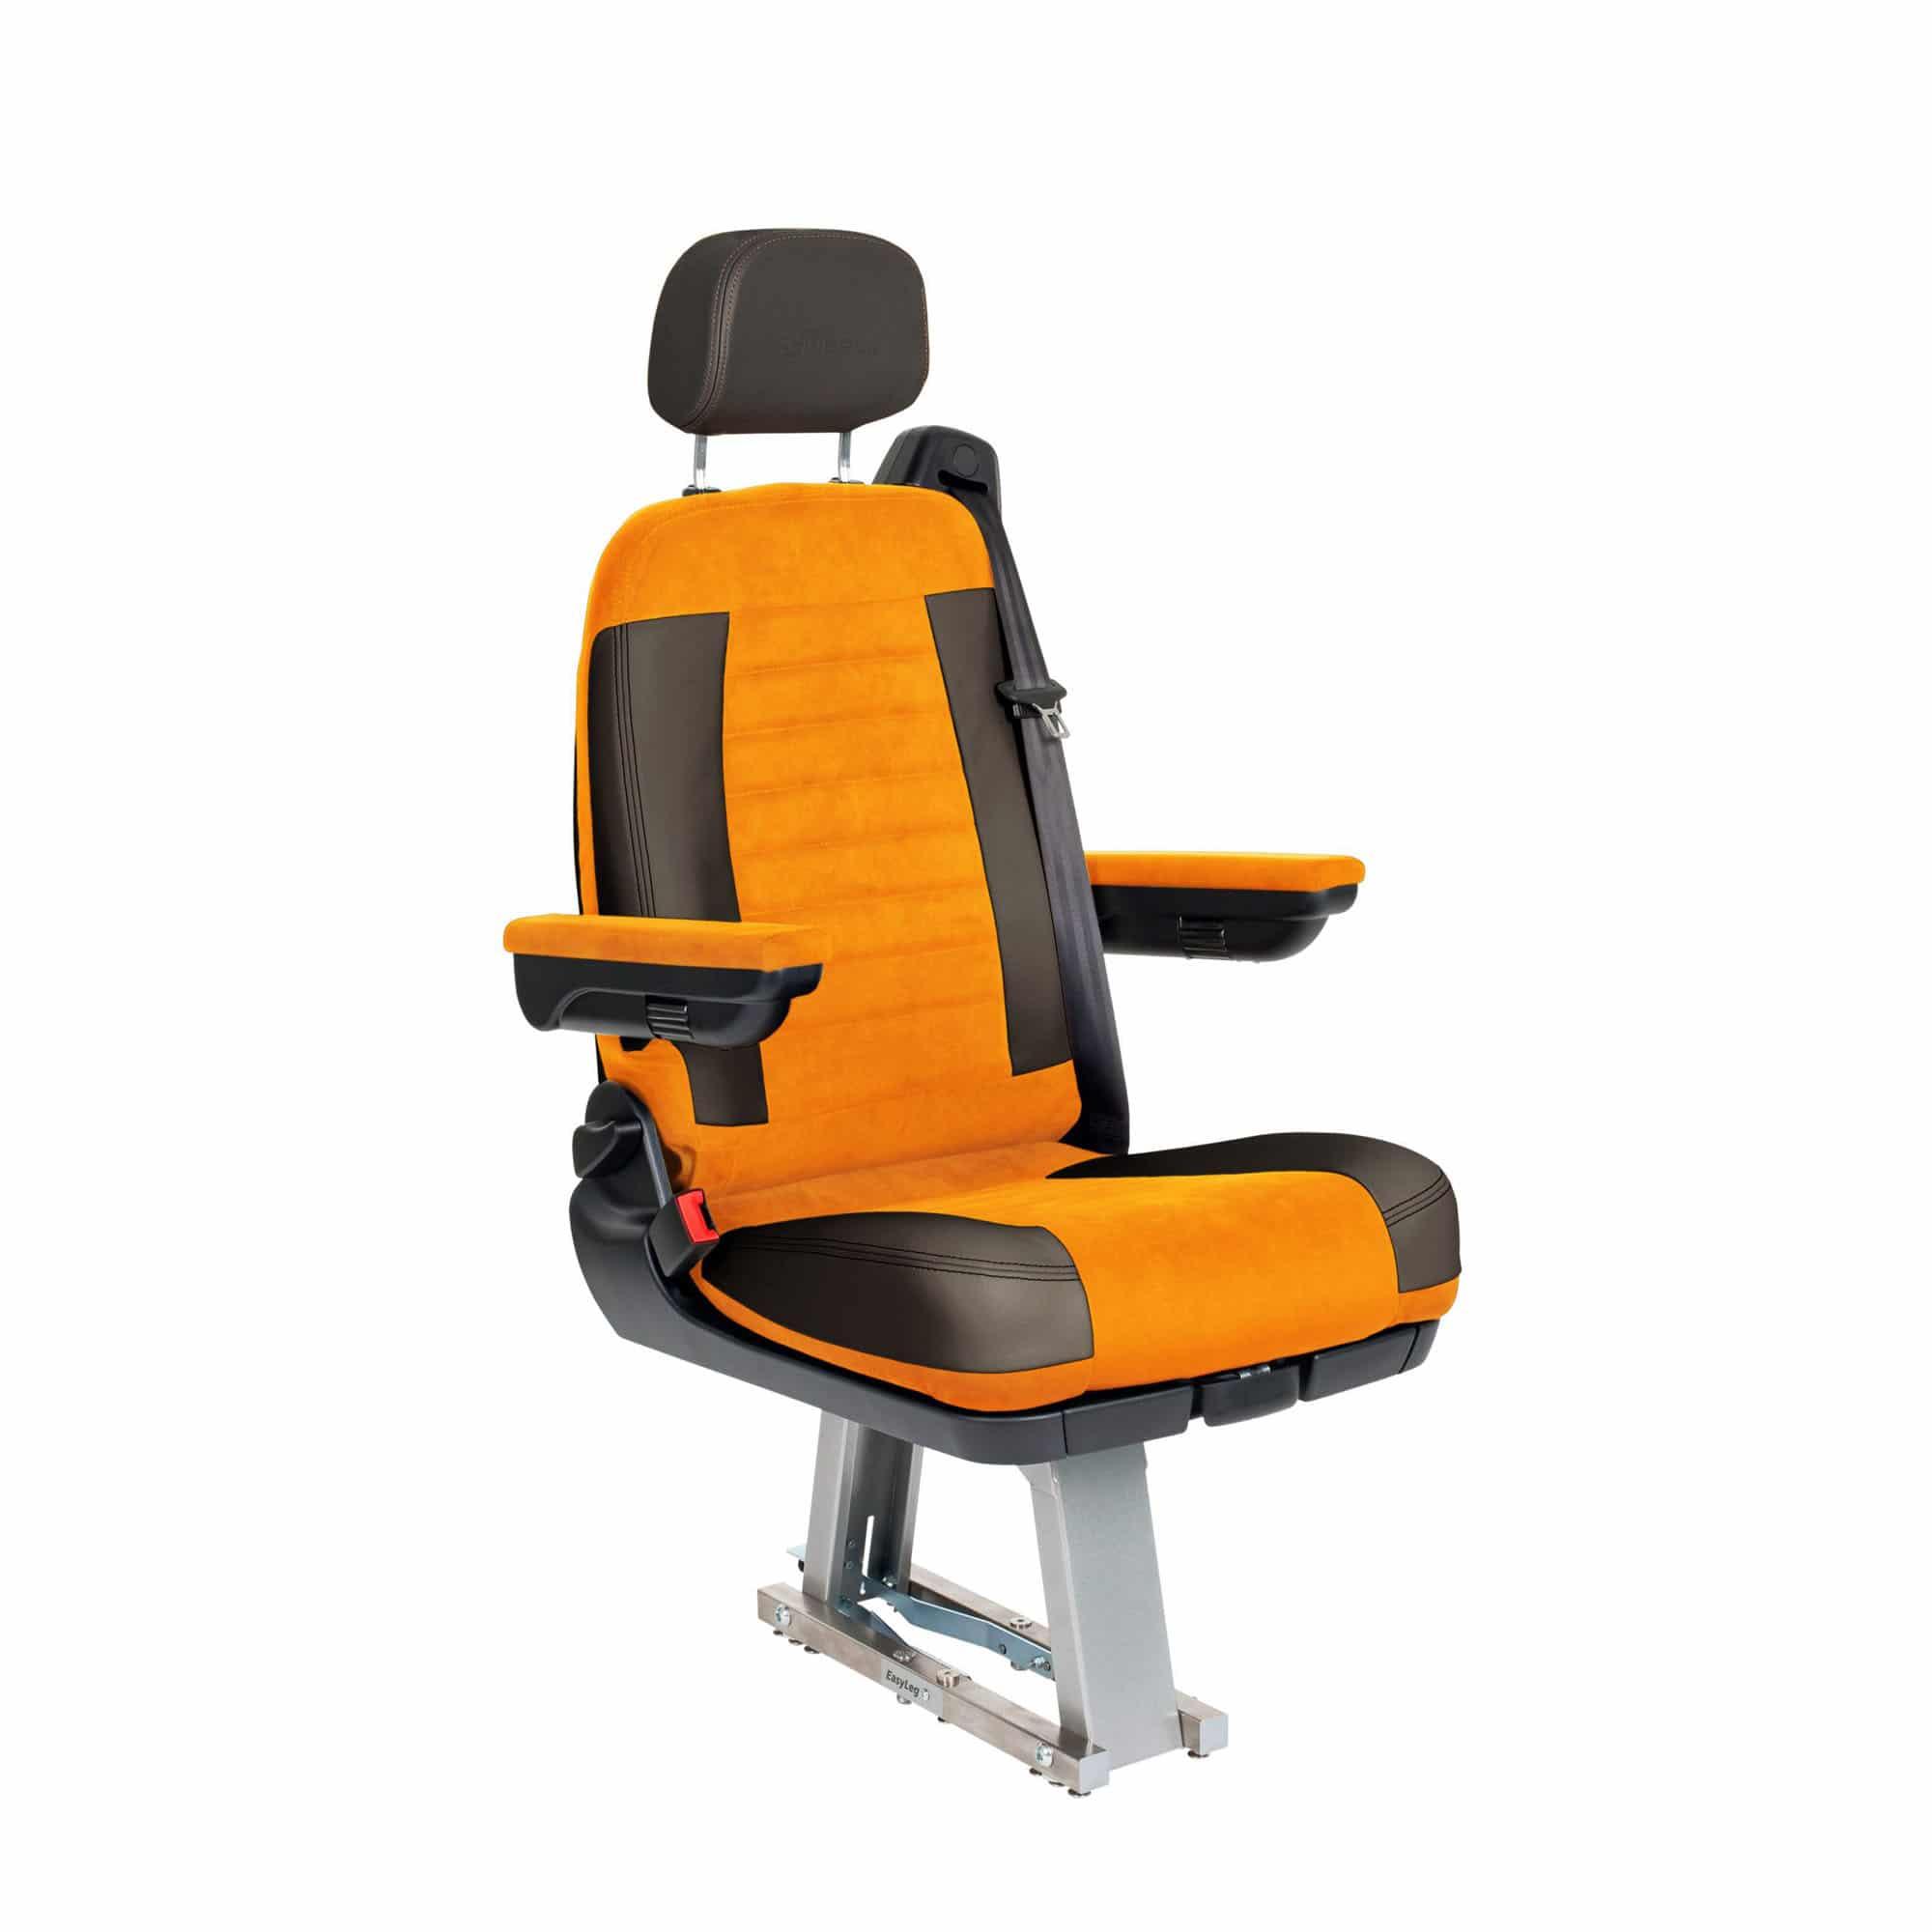 Black and orange seat